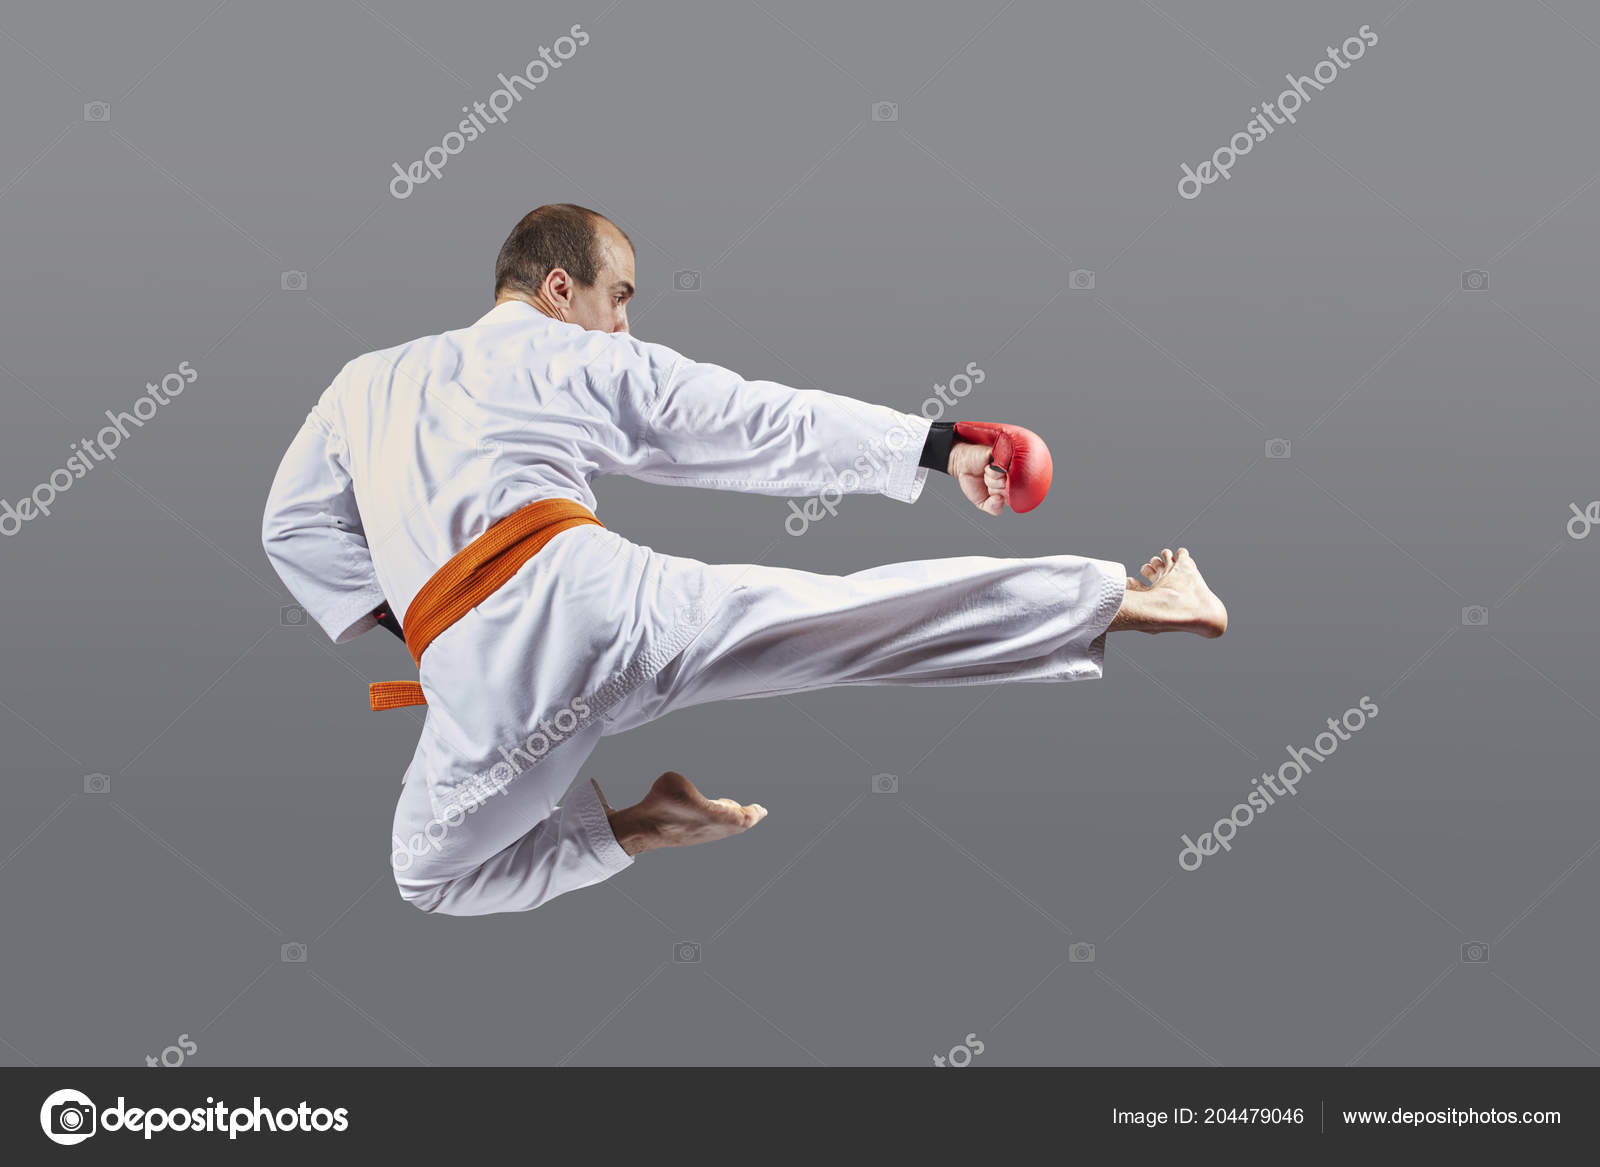 Con Cinturón Naranja Atleta Pega Una Patada Salto — Foto de stock ... eba6c682412d